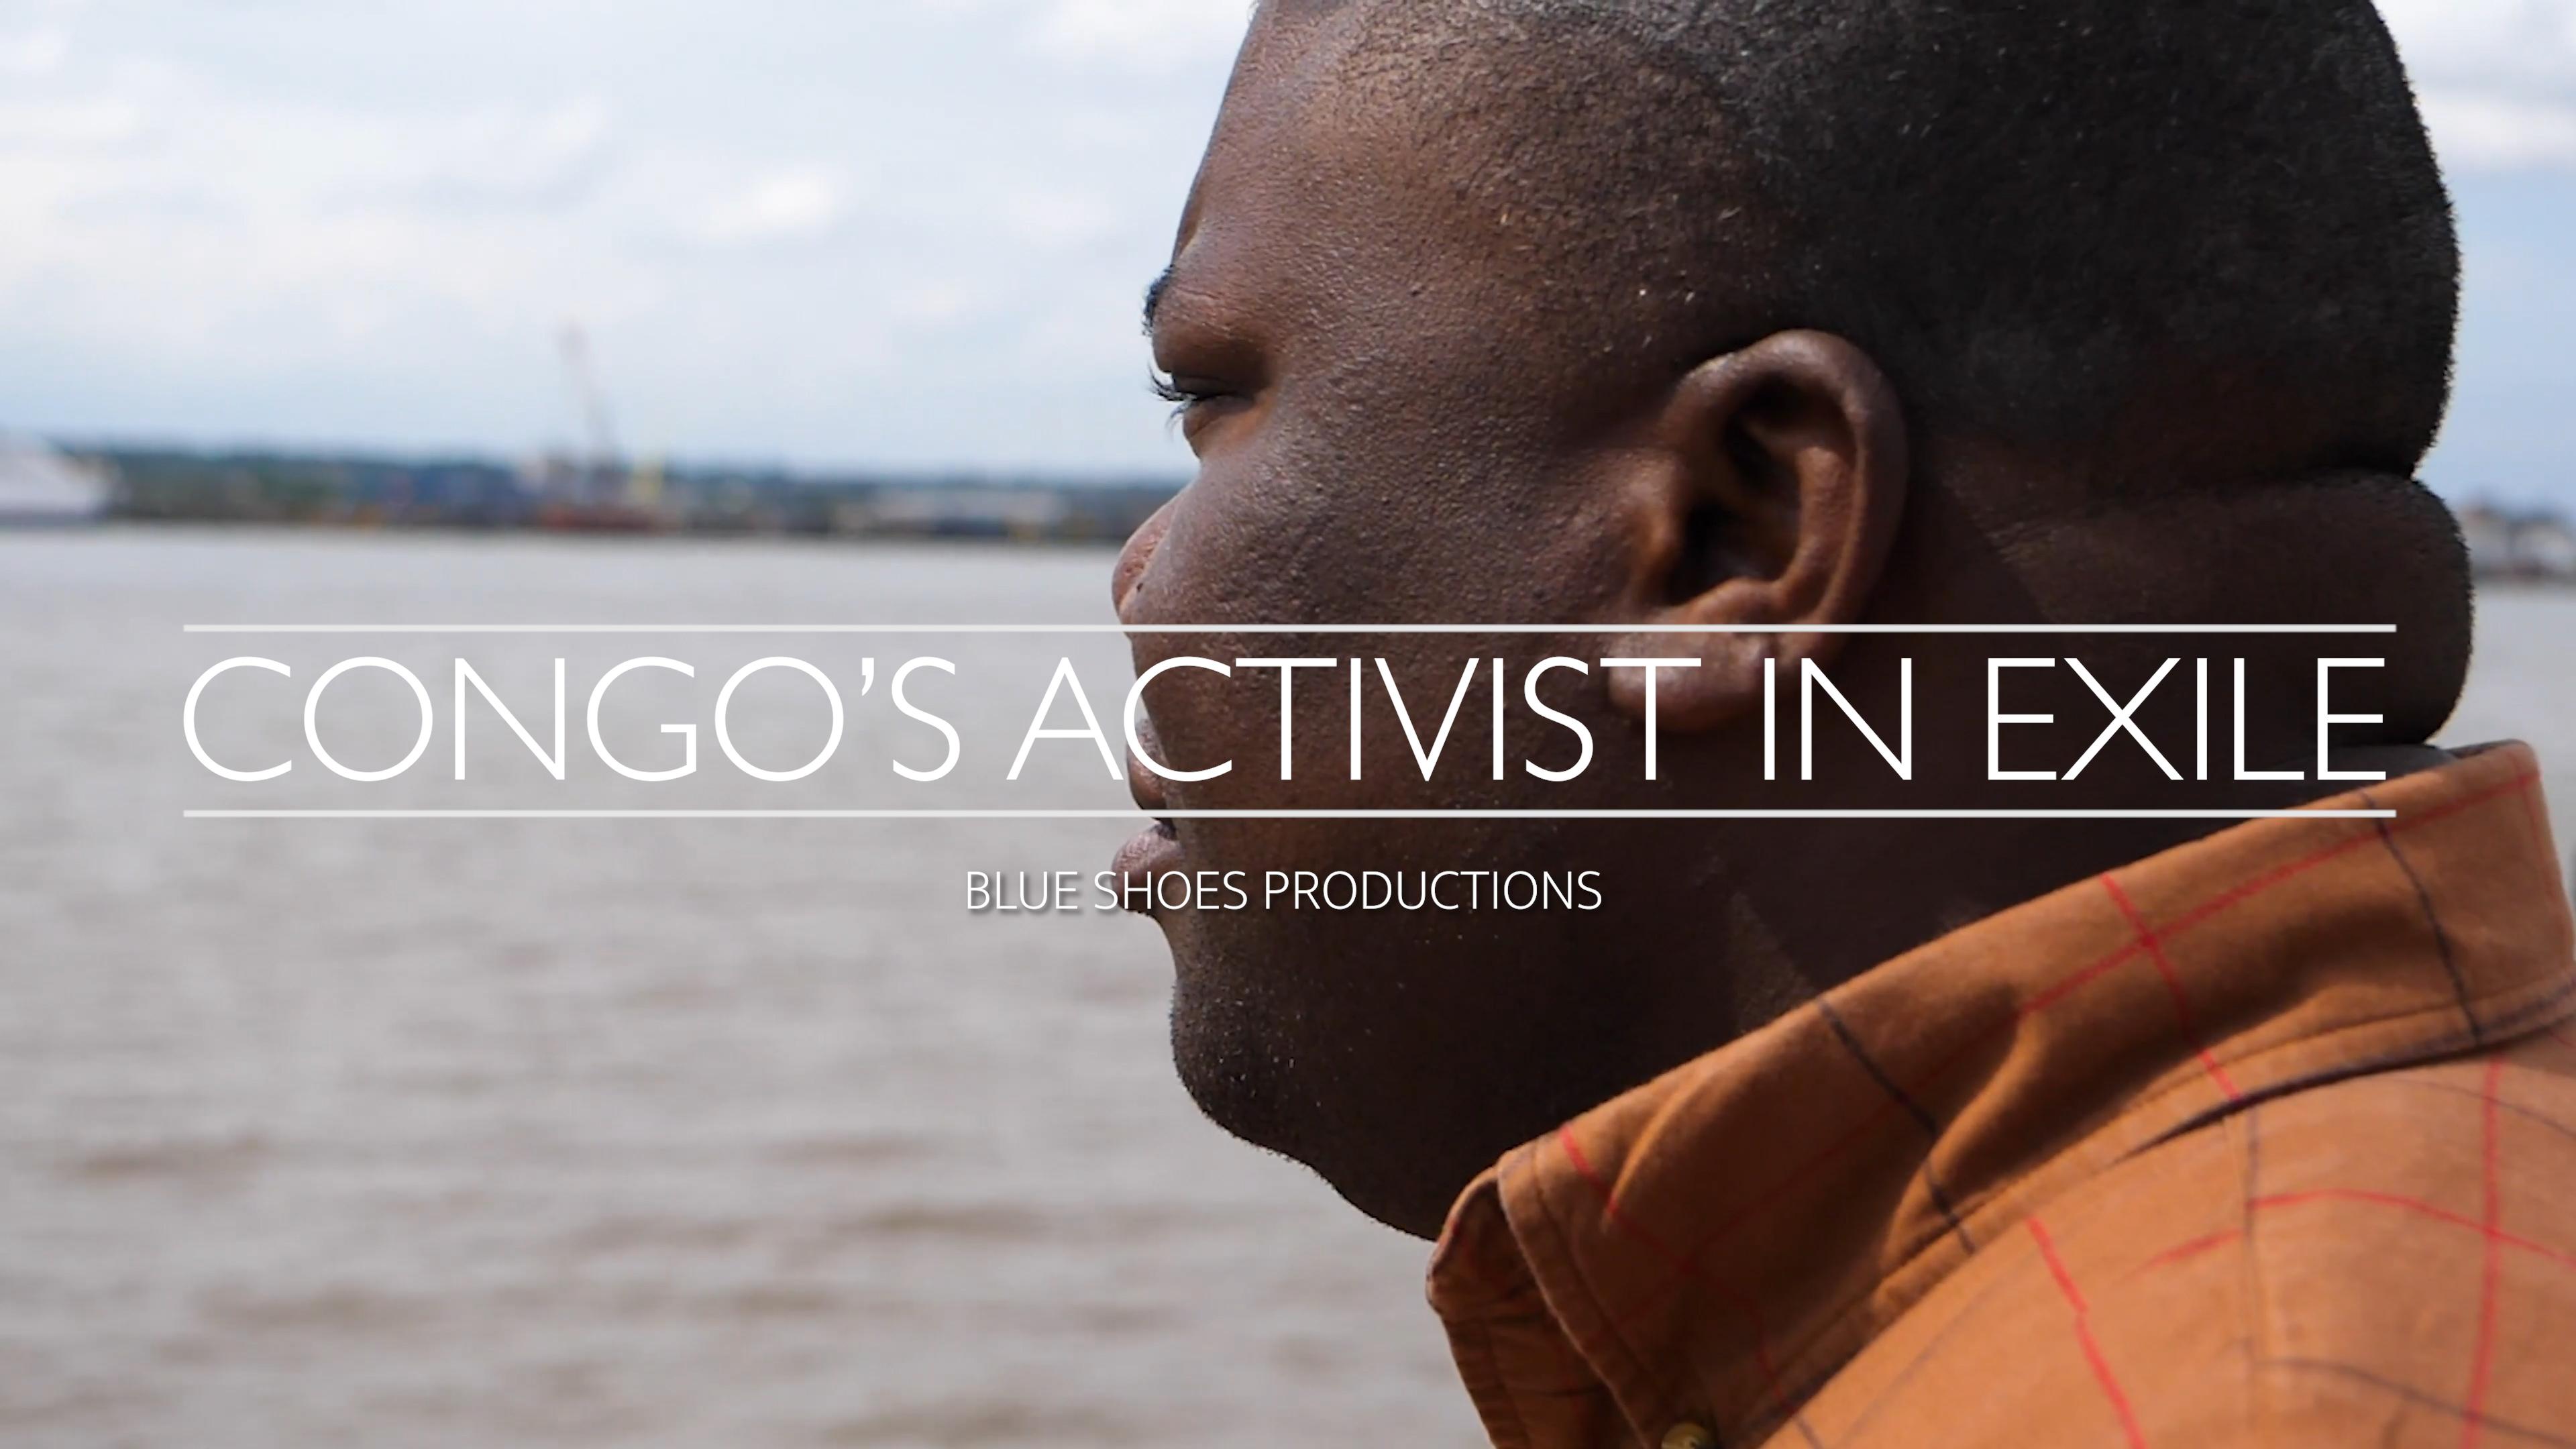 CONGO'S ACTIVIST IN EXILE